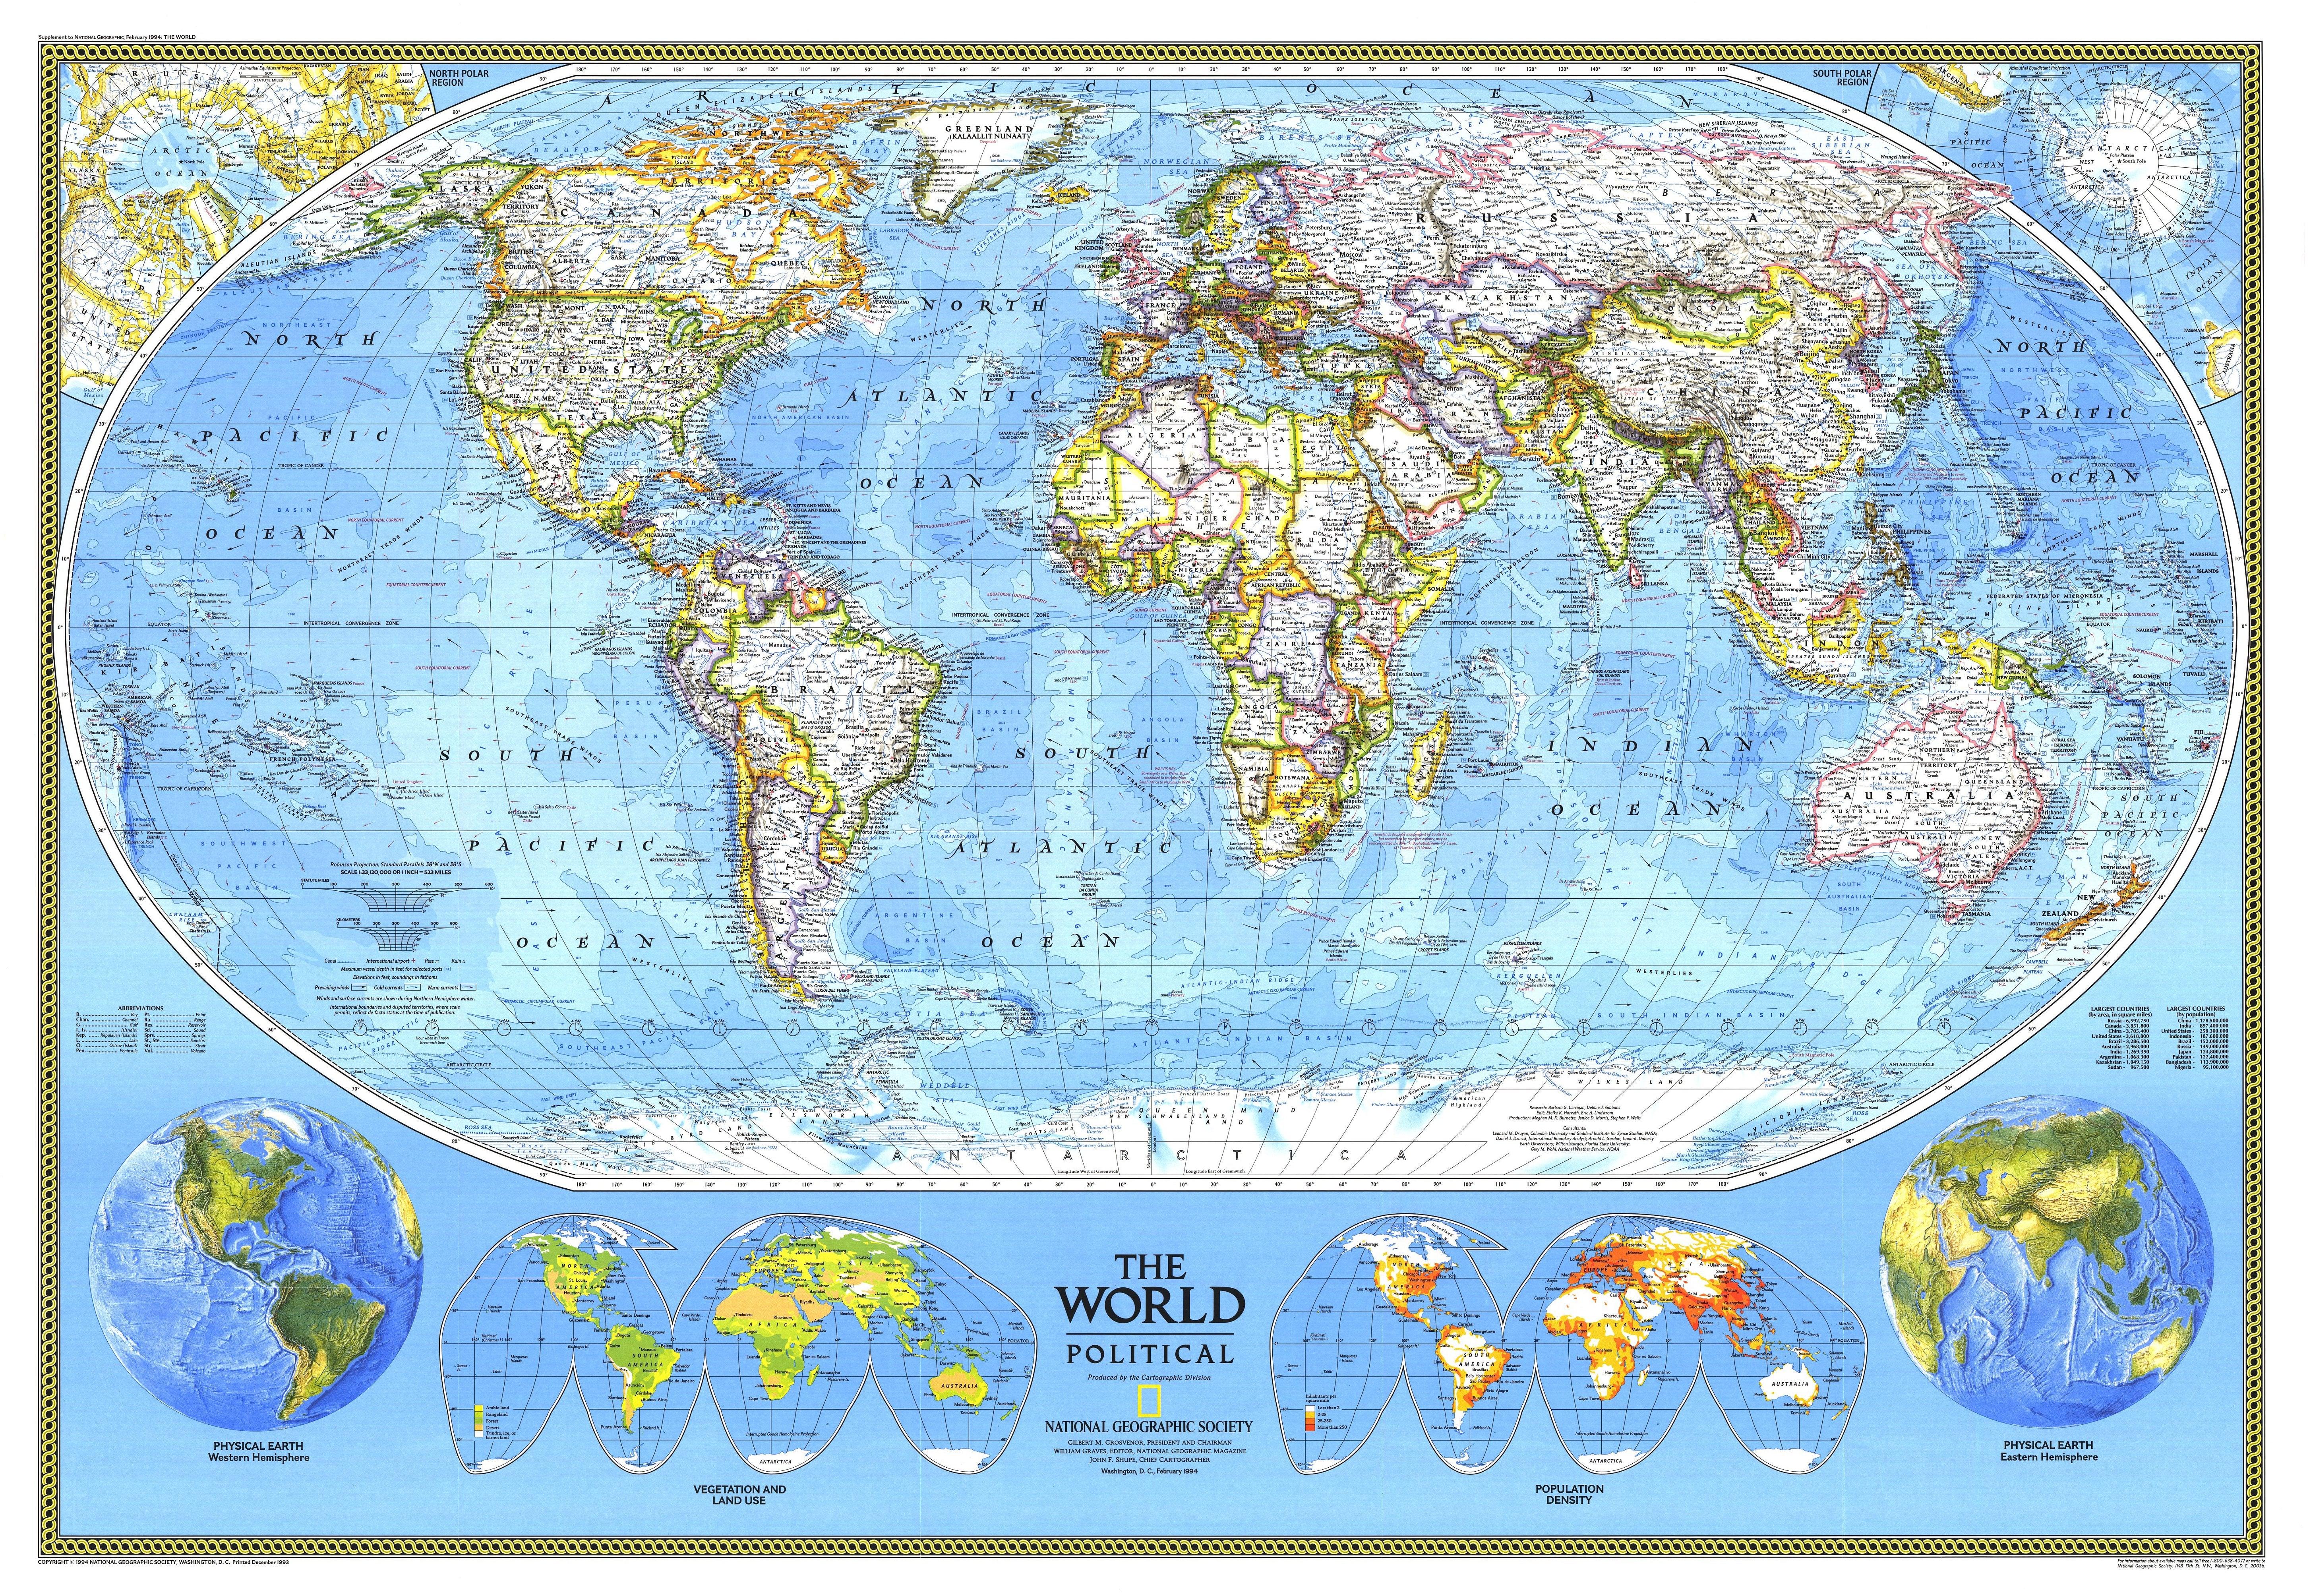 Pics of world political map